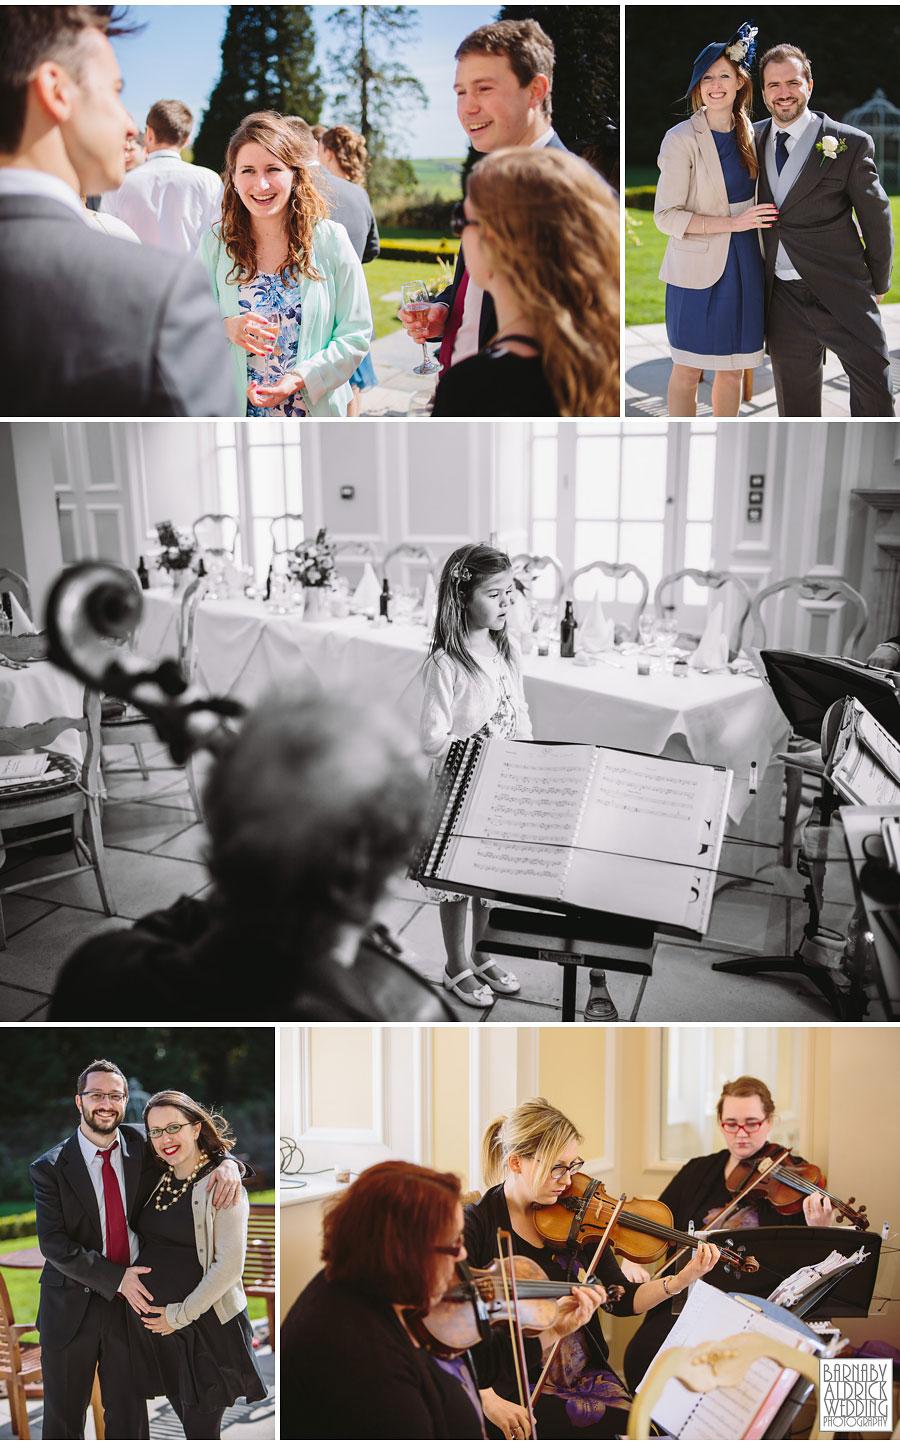 Wedding Photography at Buckland Tout Saints South Devon, Devon Wedding Photographer Barnaby Aldrick, Dartmouth Wedding; Kingswear Devon Wedding, 064